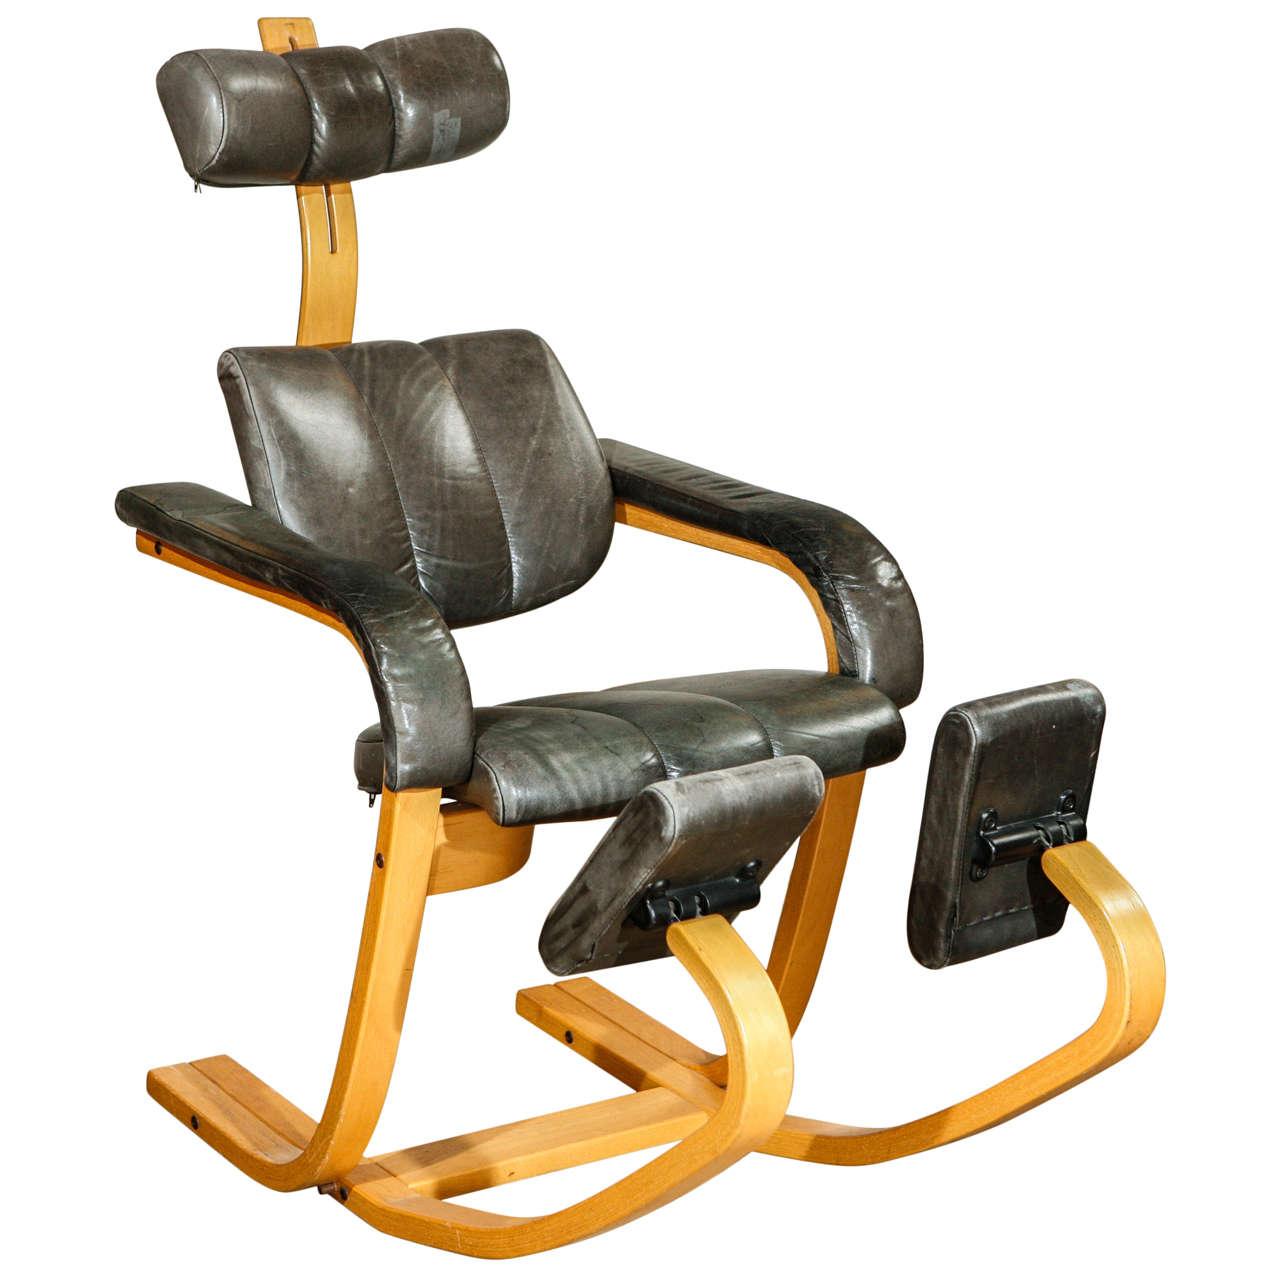 Stokke Rocking Chair